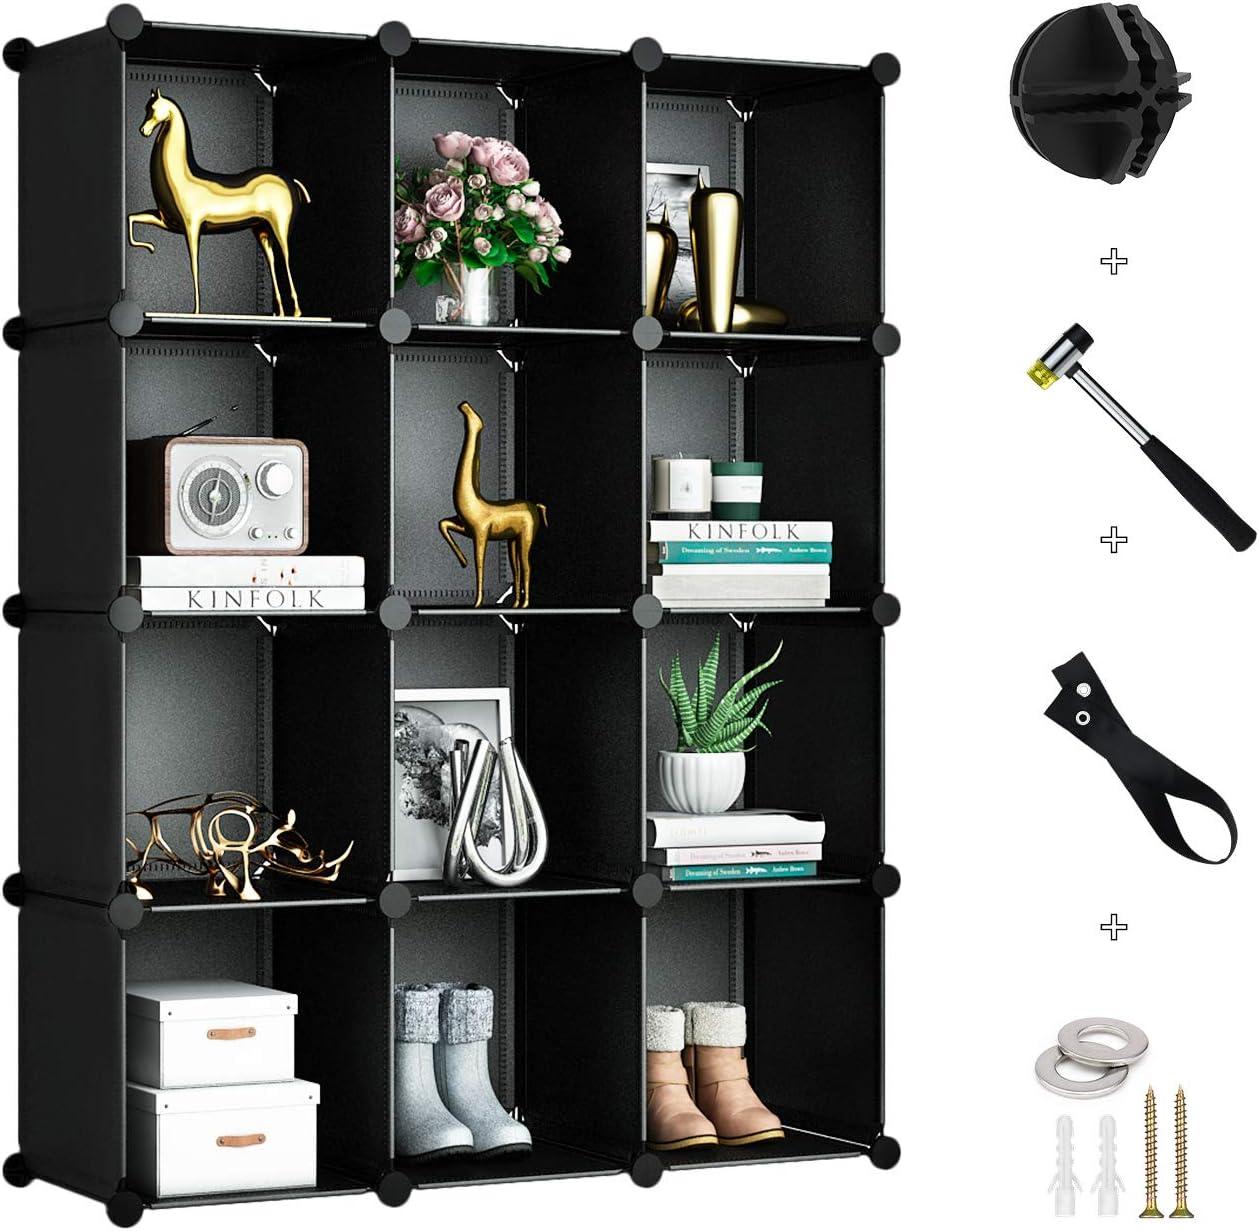 Greenstell Cube Storage Organizer, Plastic Modular Closet Organizer, 12-Cube Storage Cubes Organizer, Cube Storage Cabinet Book Shelf Shelving for Bedroom, Living Room, Office Black